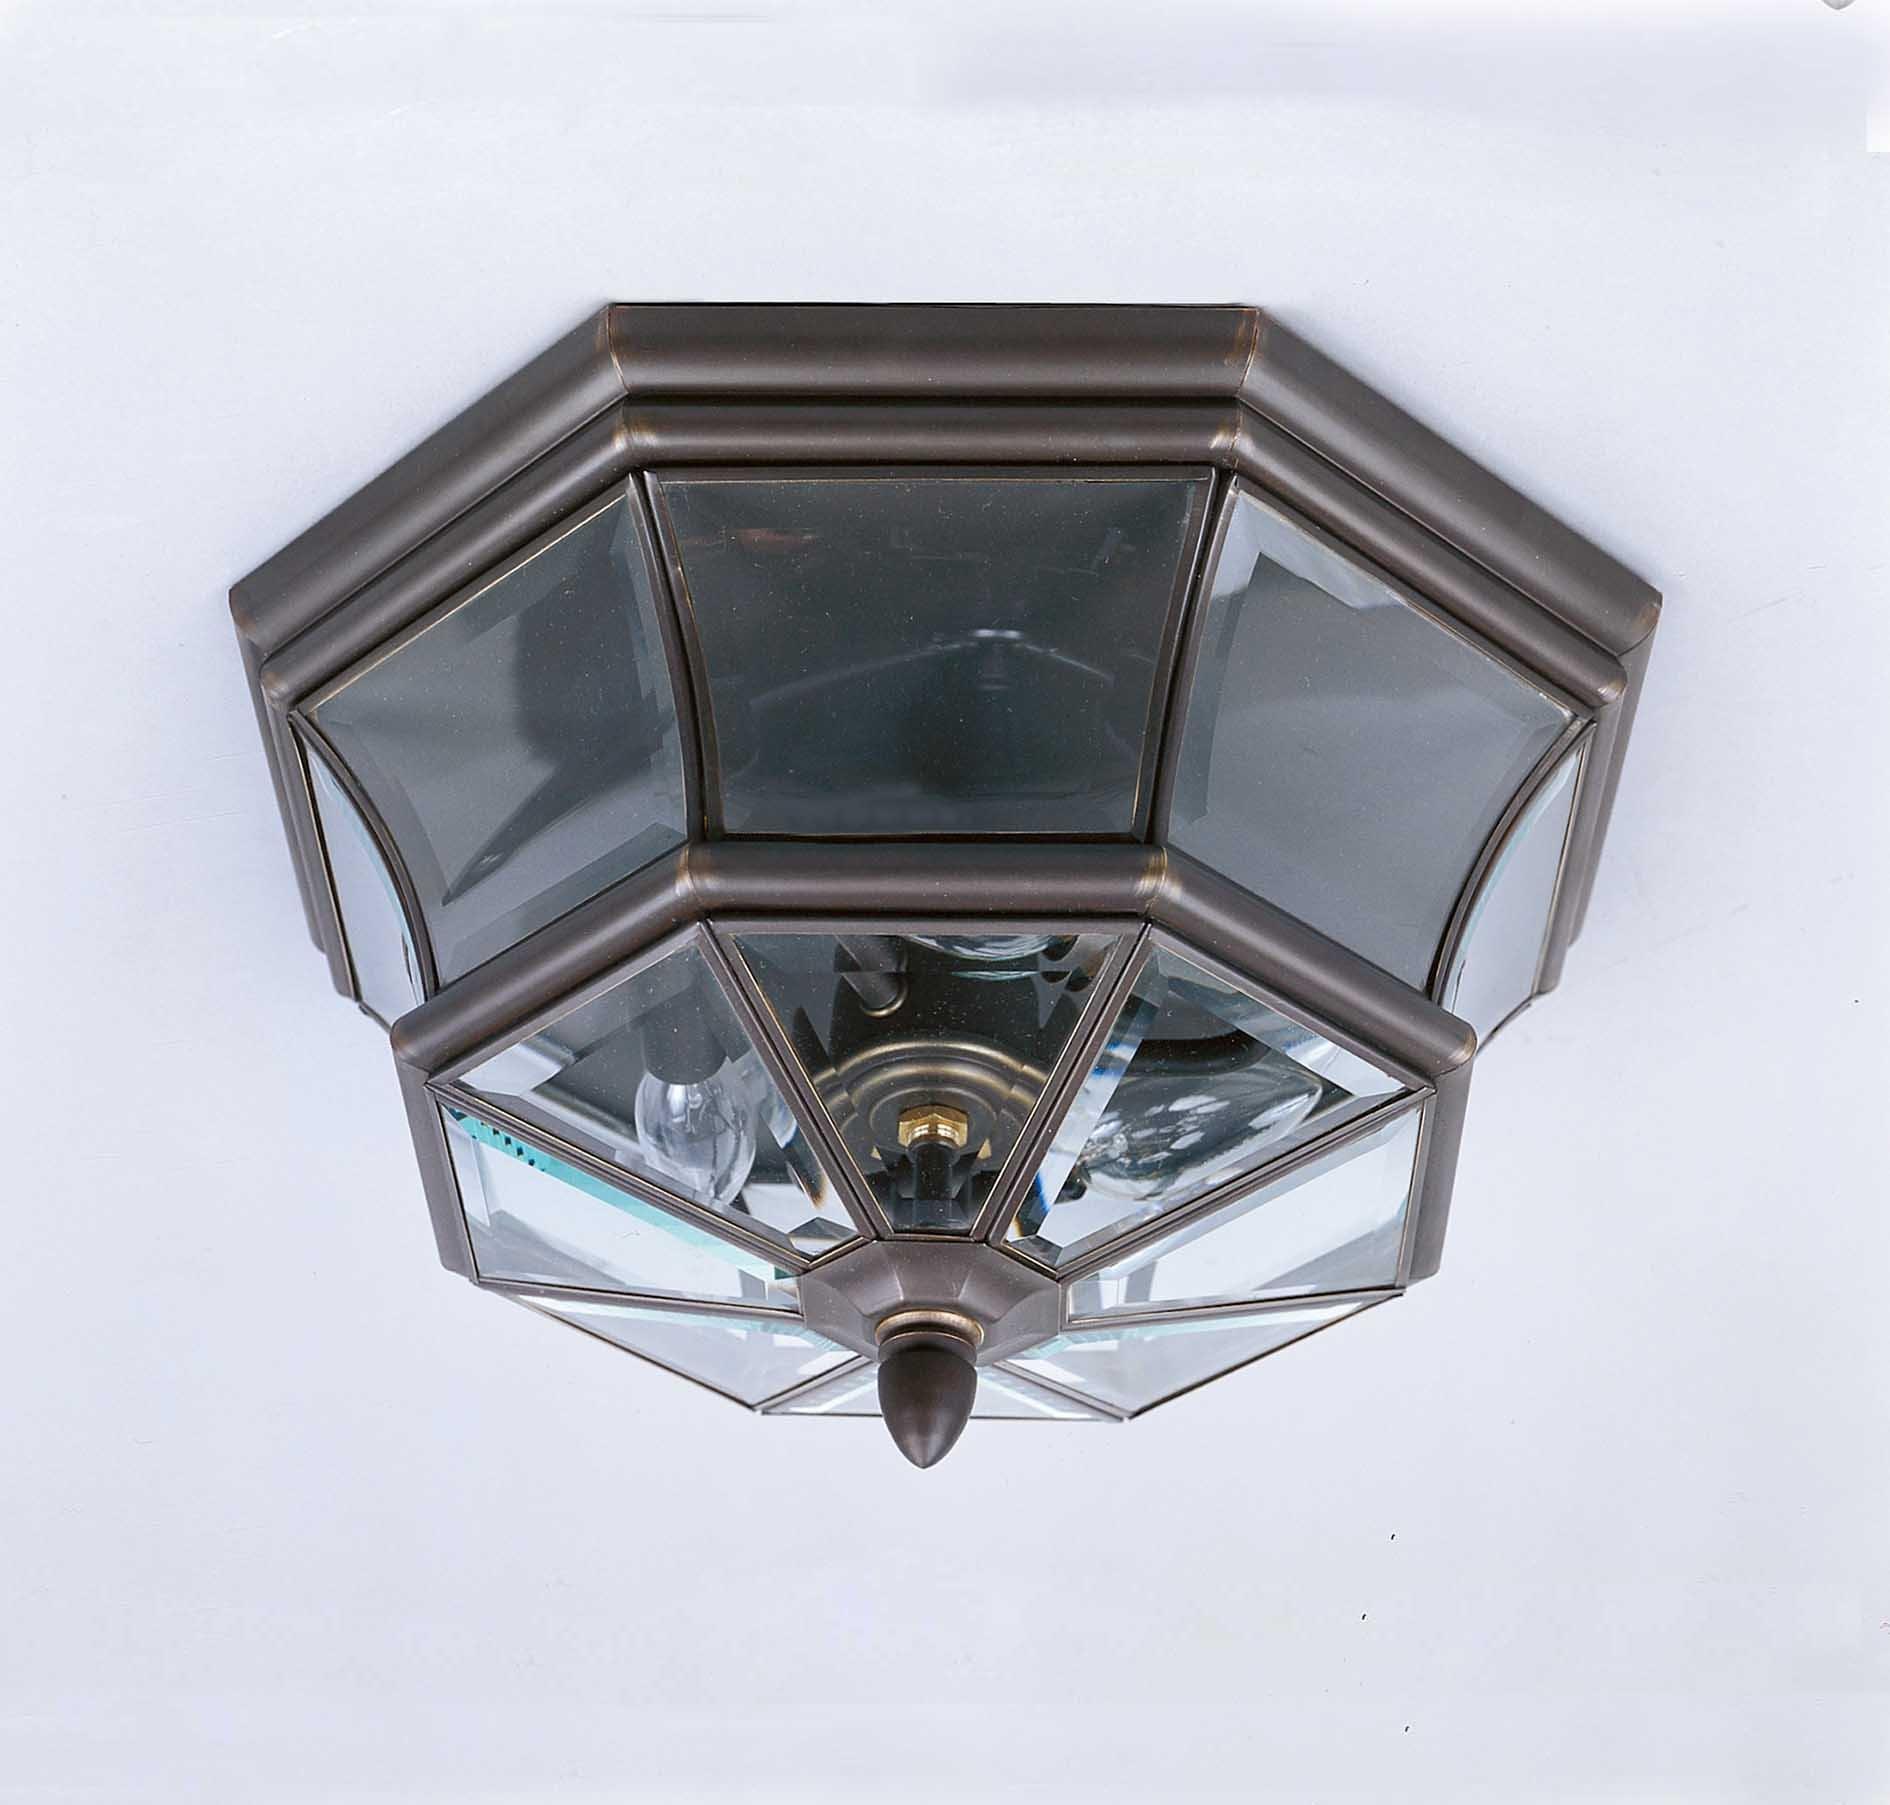 Quoizel NY1794Z 3-Light Newbury Outdoor Lantern in Medici Bronze